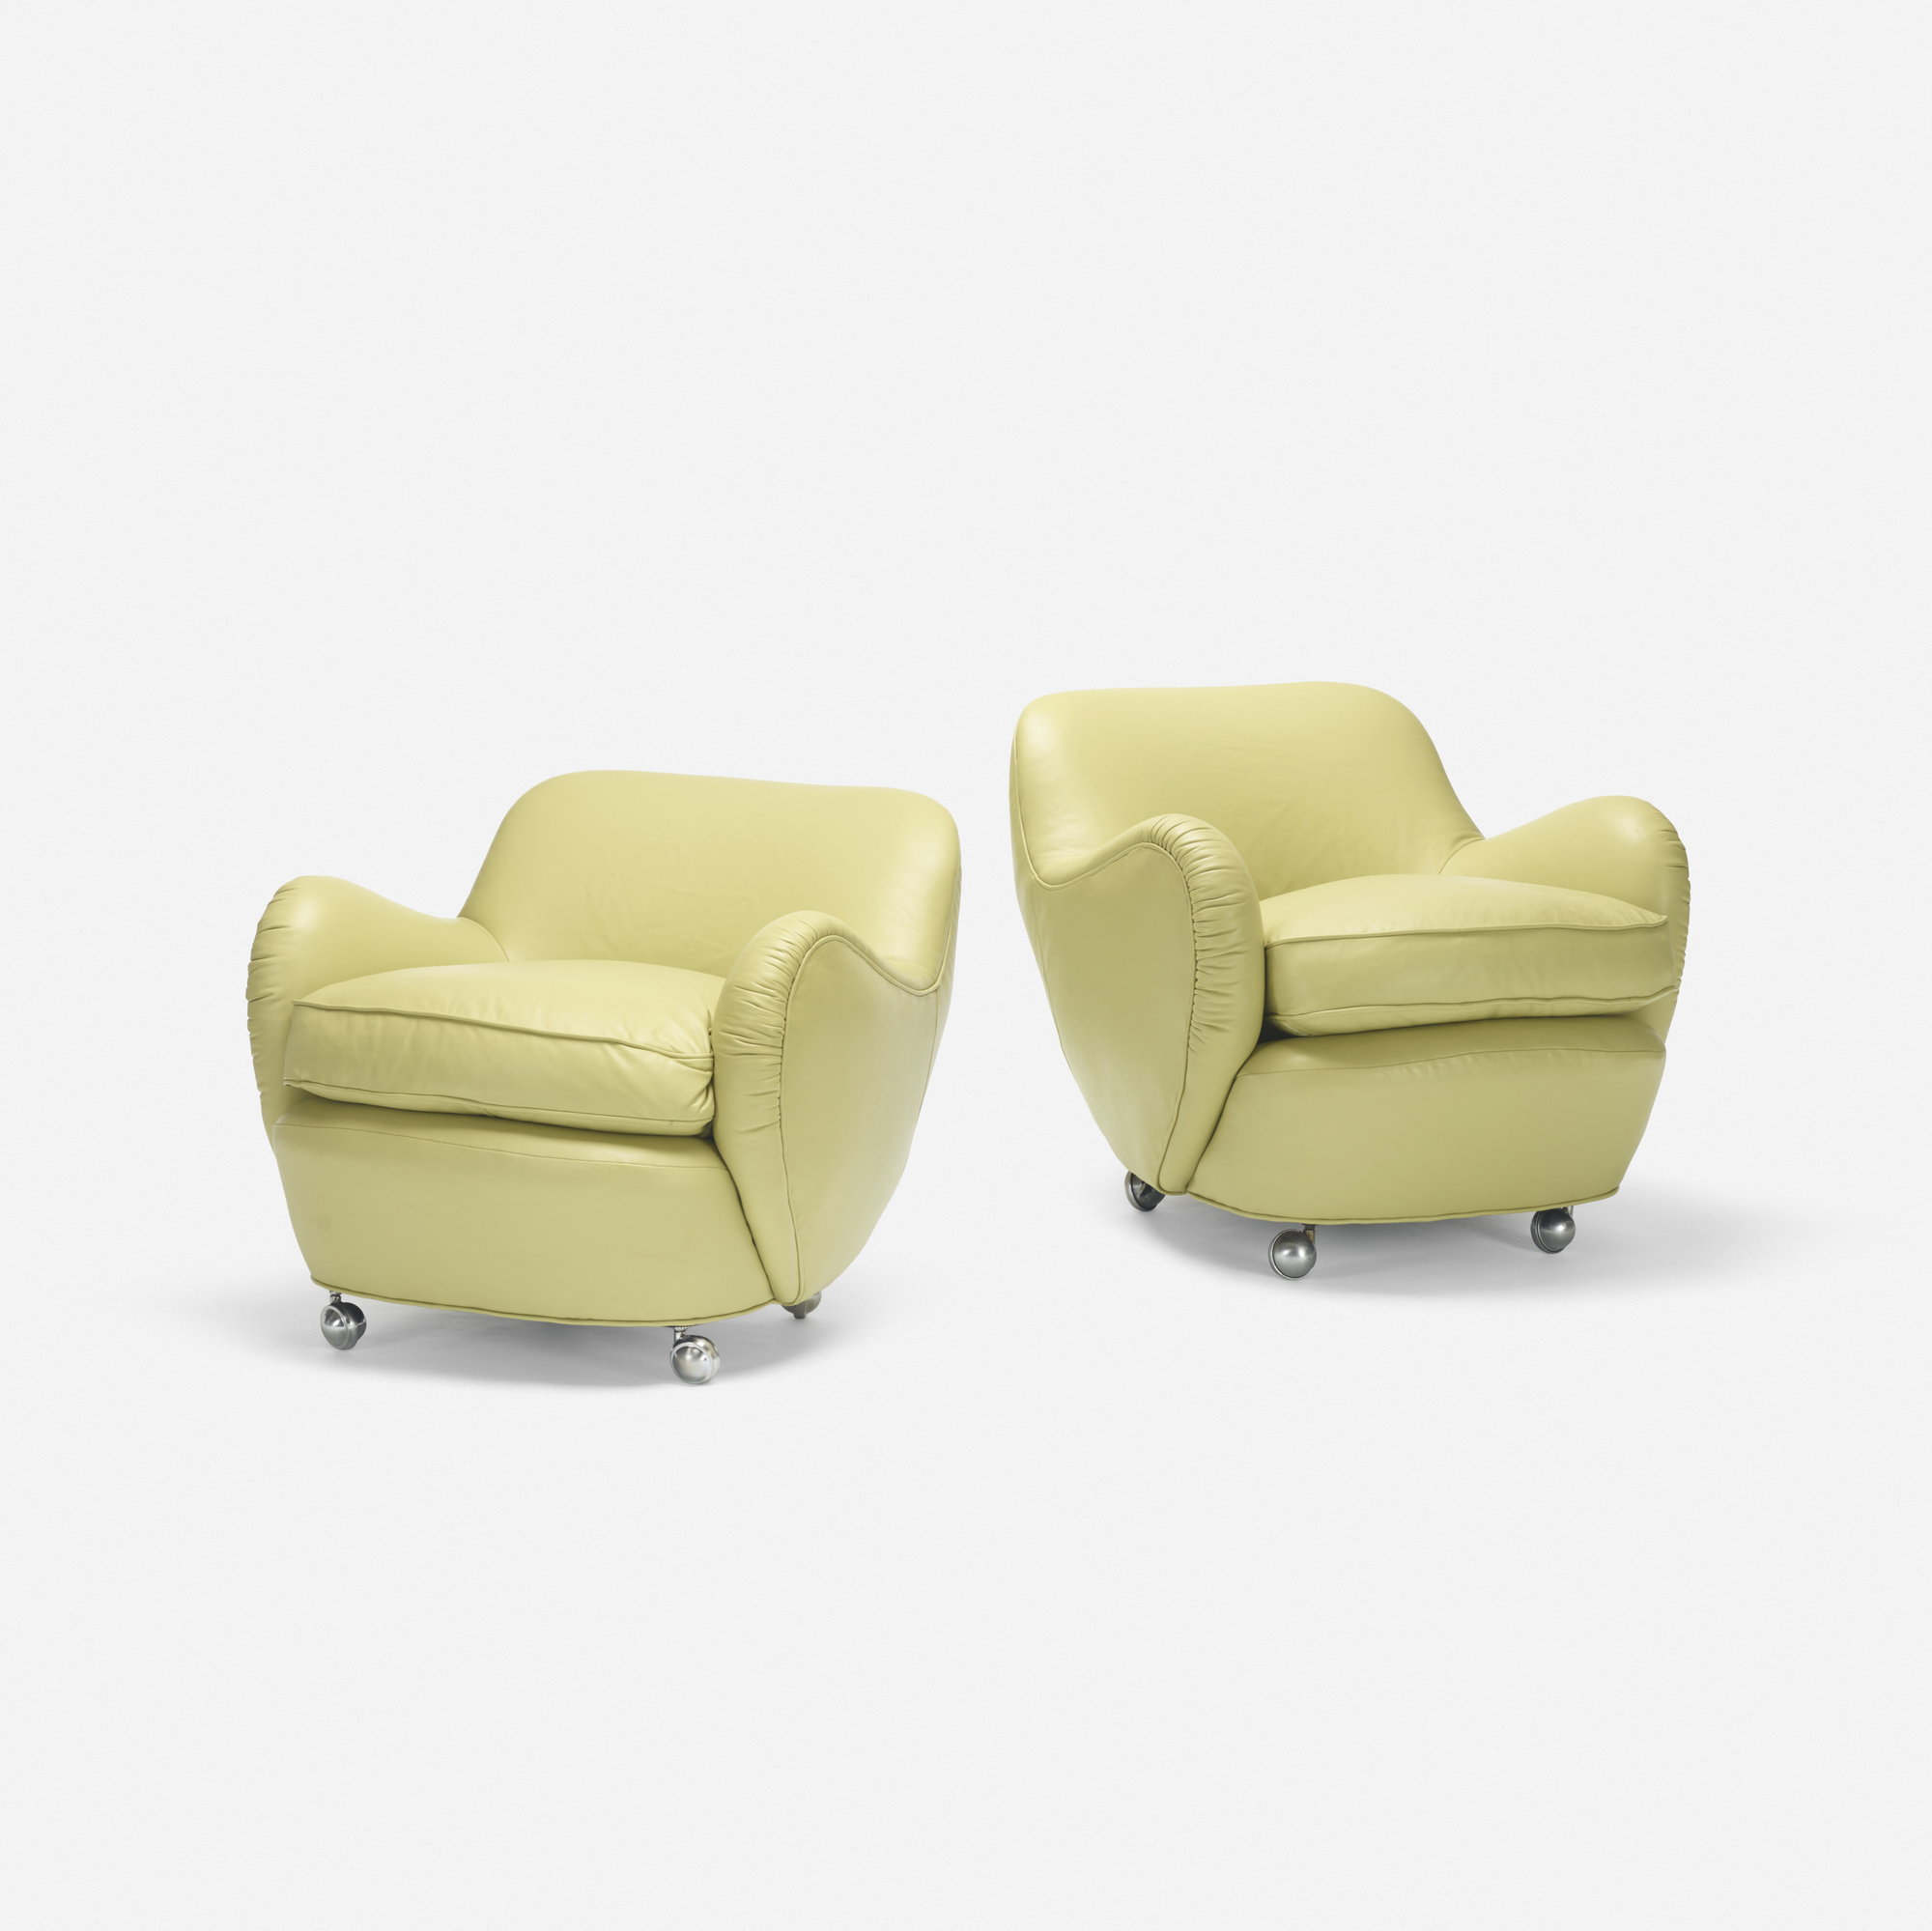 361: Vladimir Kagan / Barrel lounge chairs model 100A, pair (1 of 2)